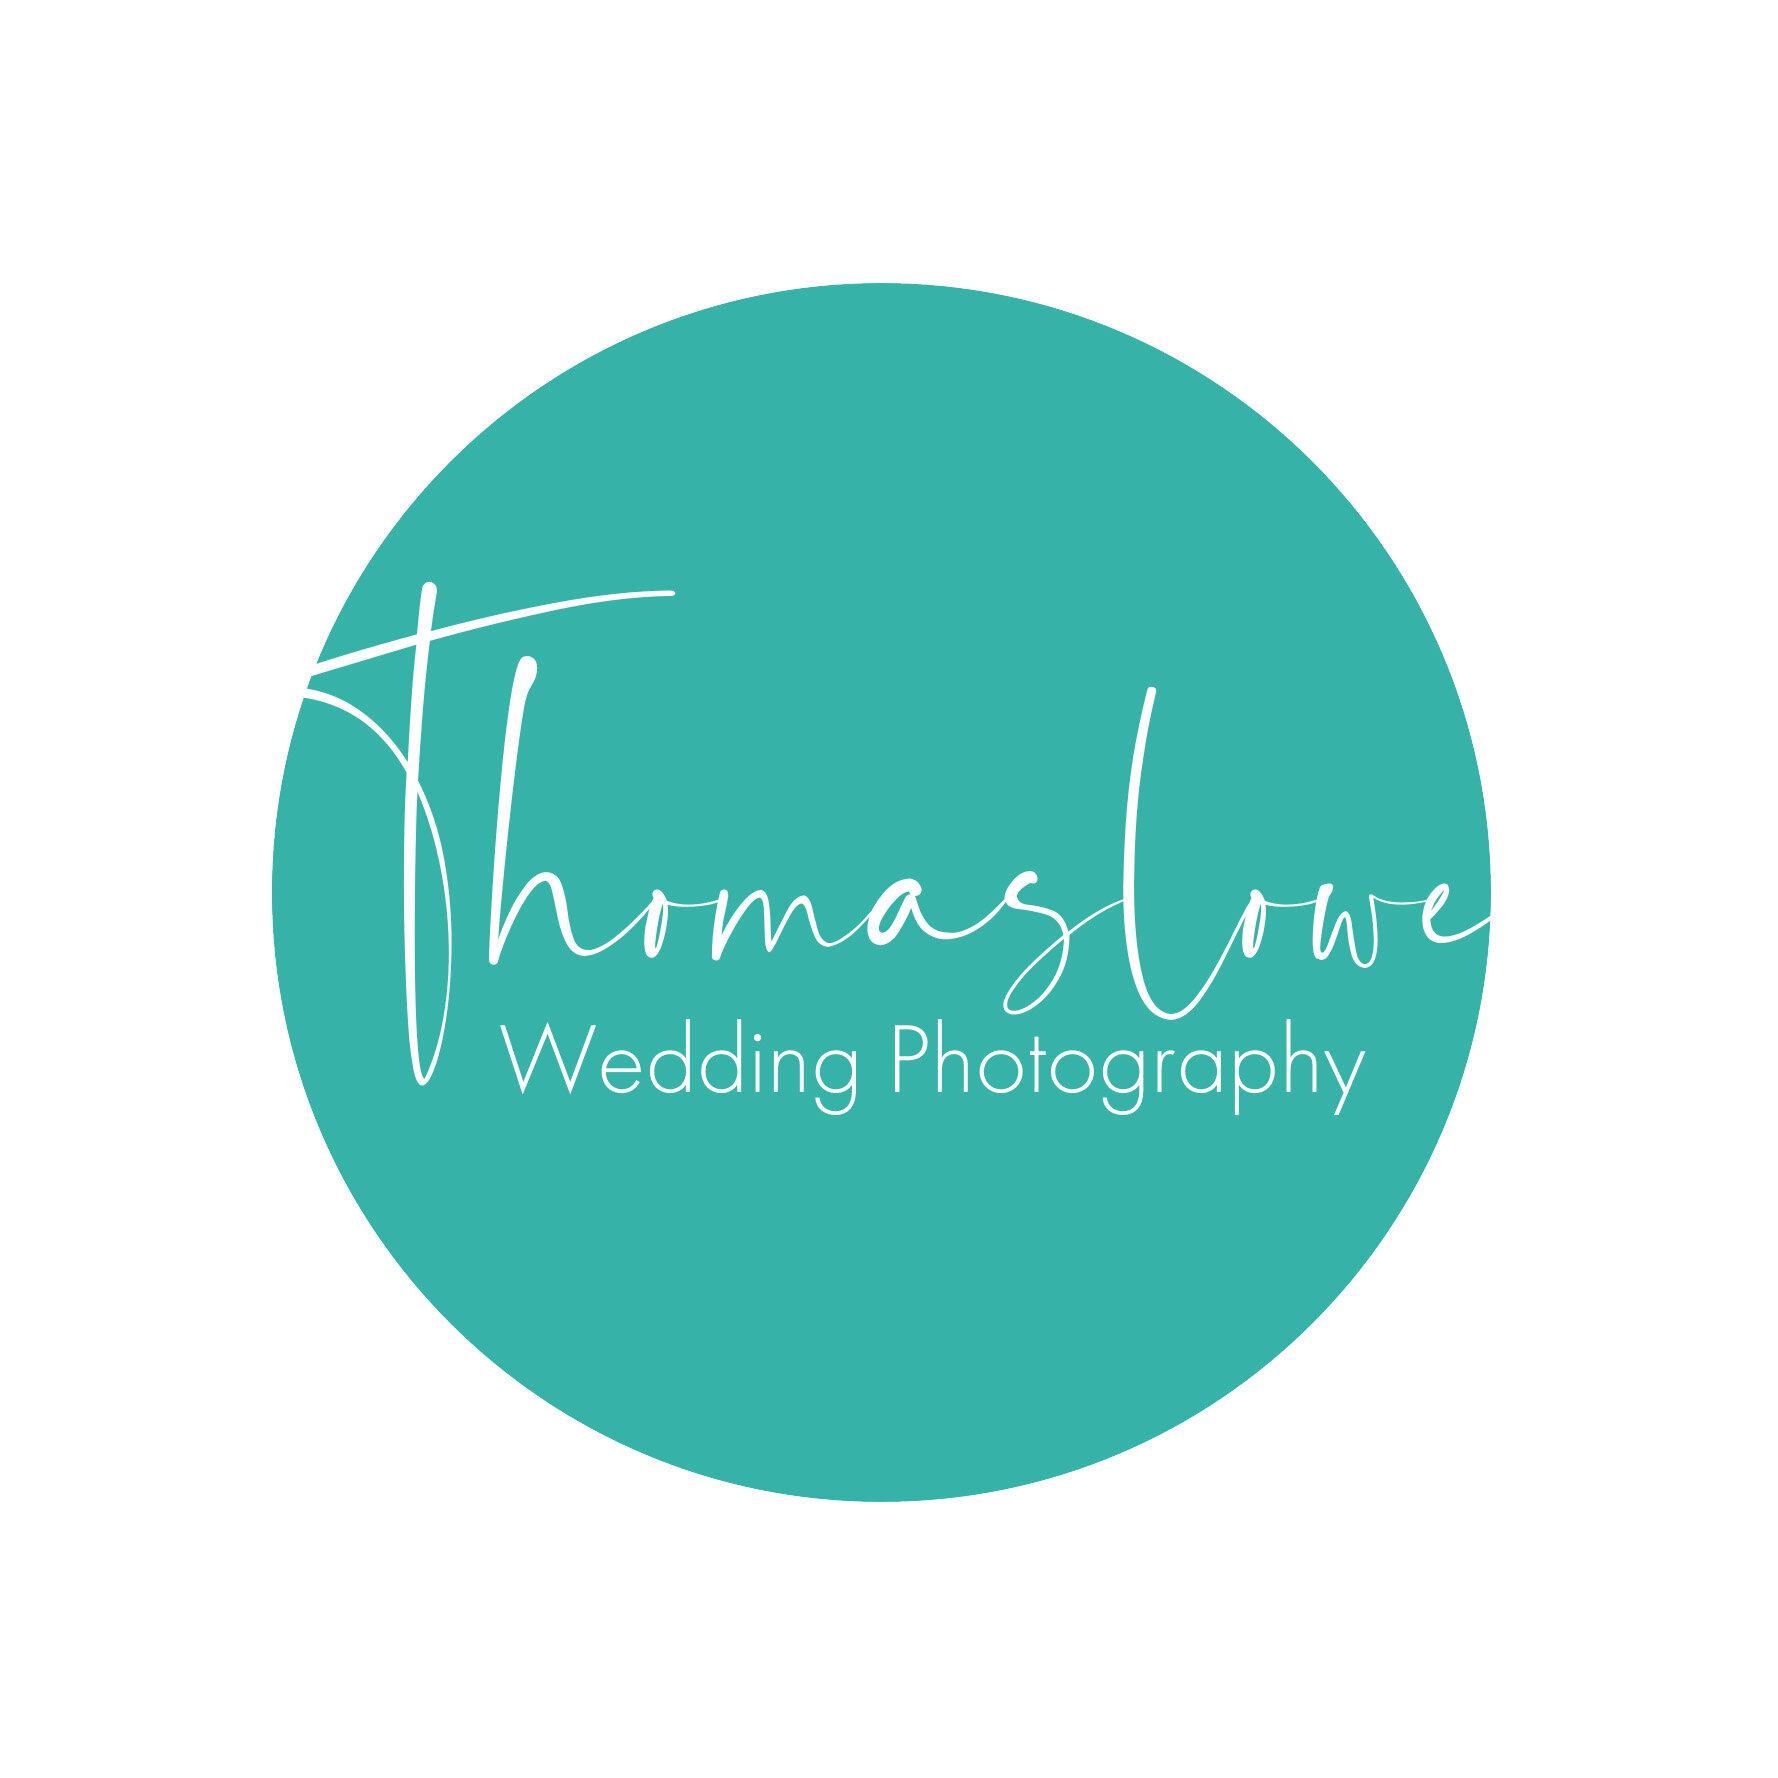 thomas Lowe Wedding Photography